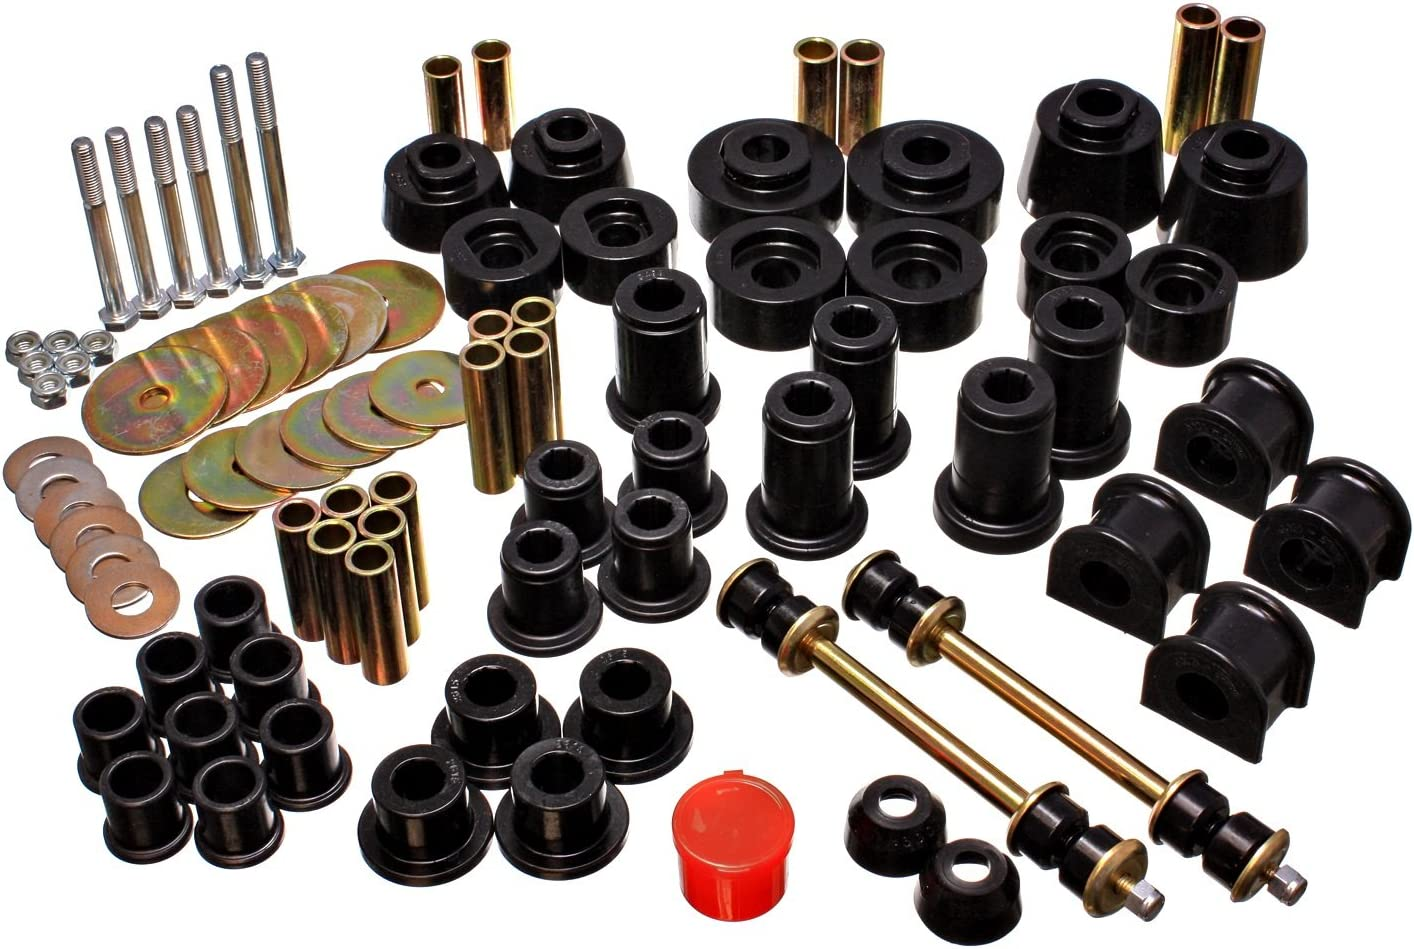 Color : BLACK, Length : 37mm, Size : M3 10PCS YJZG 10pcs M2 M2.5 M3 M4 Round Aluminum Column Rods Standoff Colourful Spacer Stud Fastener for Multirotor